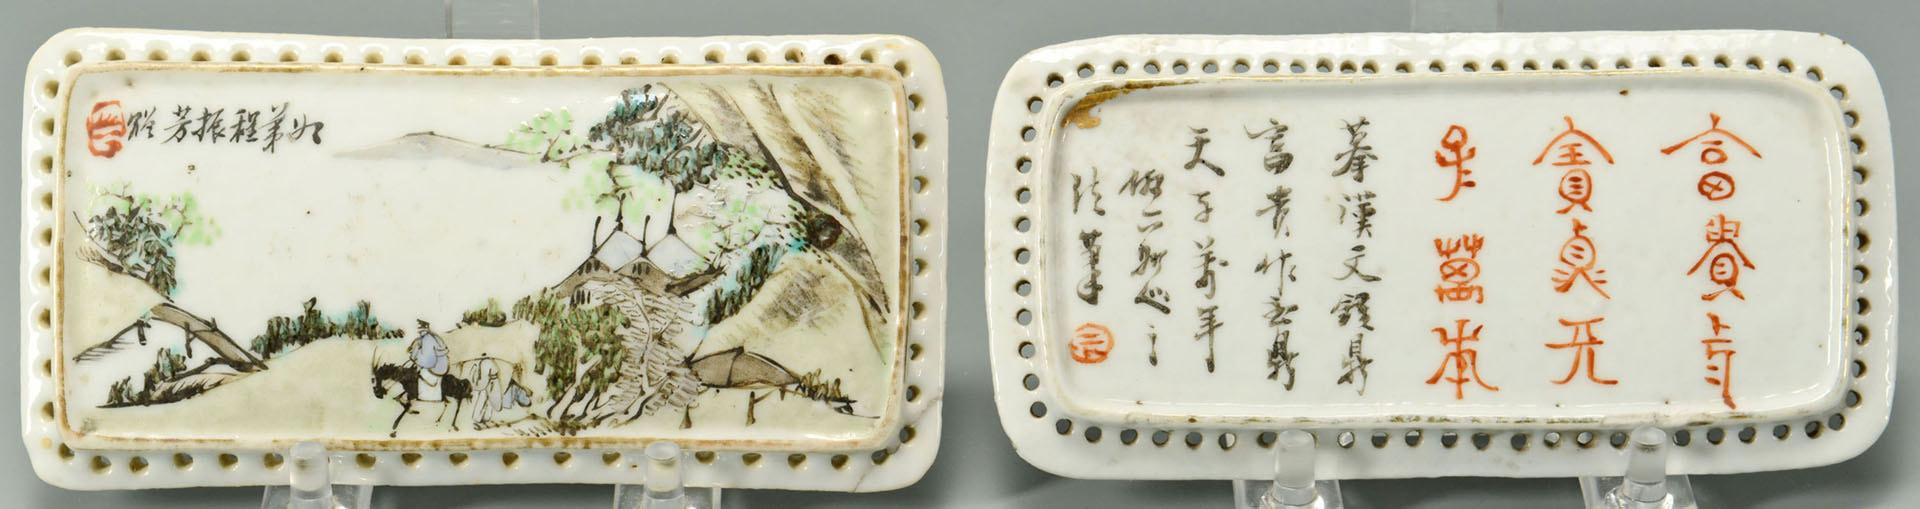 Lot 450: 6 pcs Chinese porcelain desk or scholar's objects